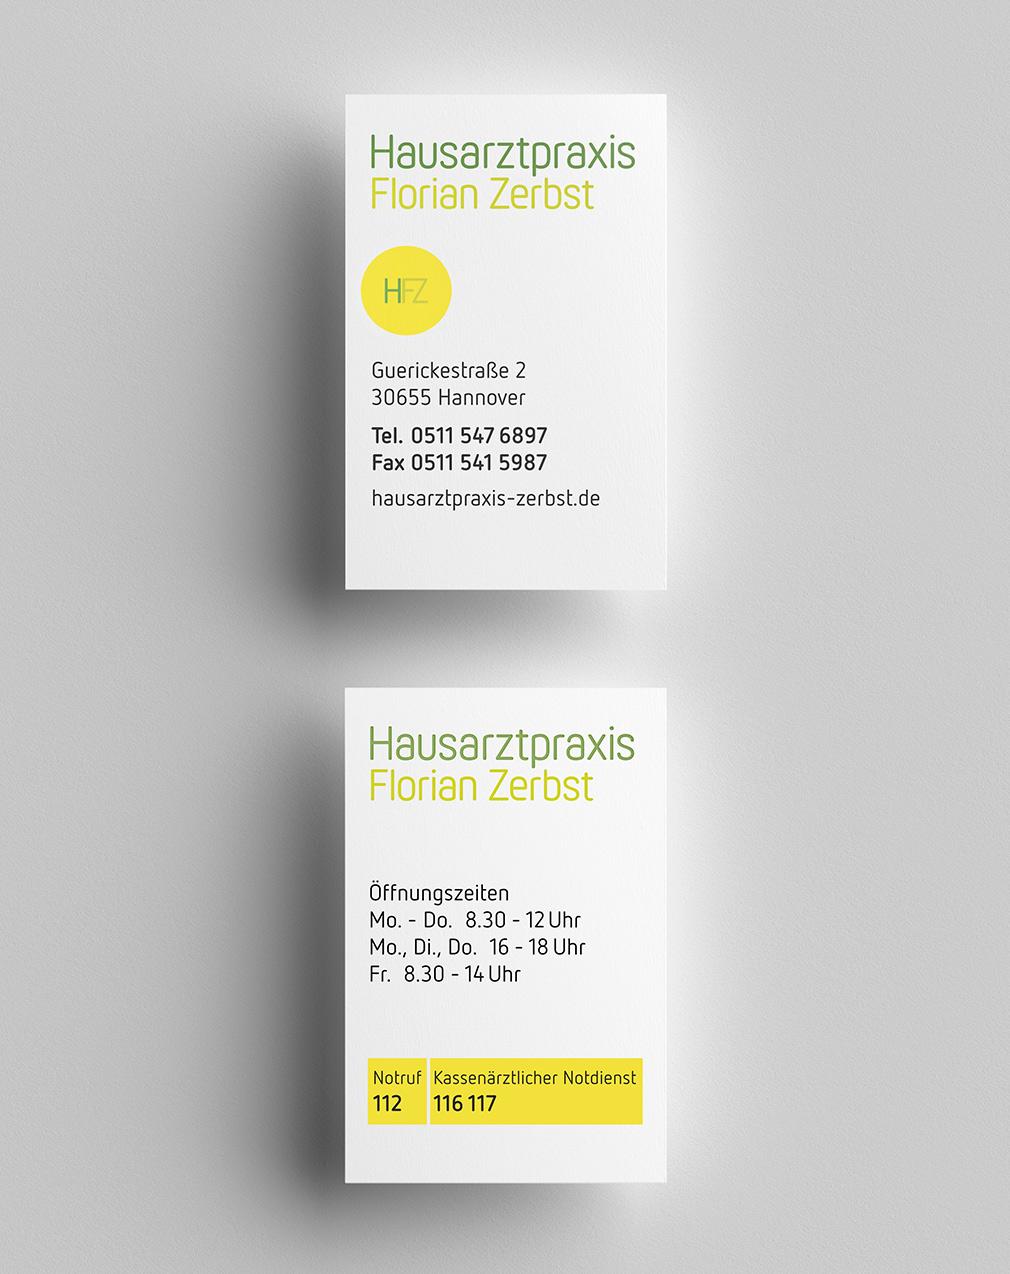 Corporate Design Arztpraxis, Visitenkarten, Branding, Logo Design